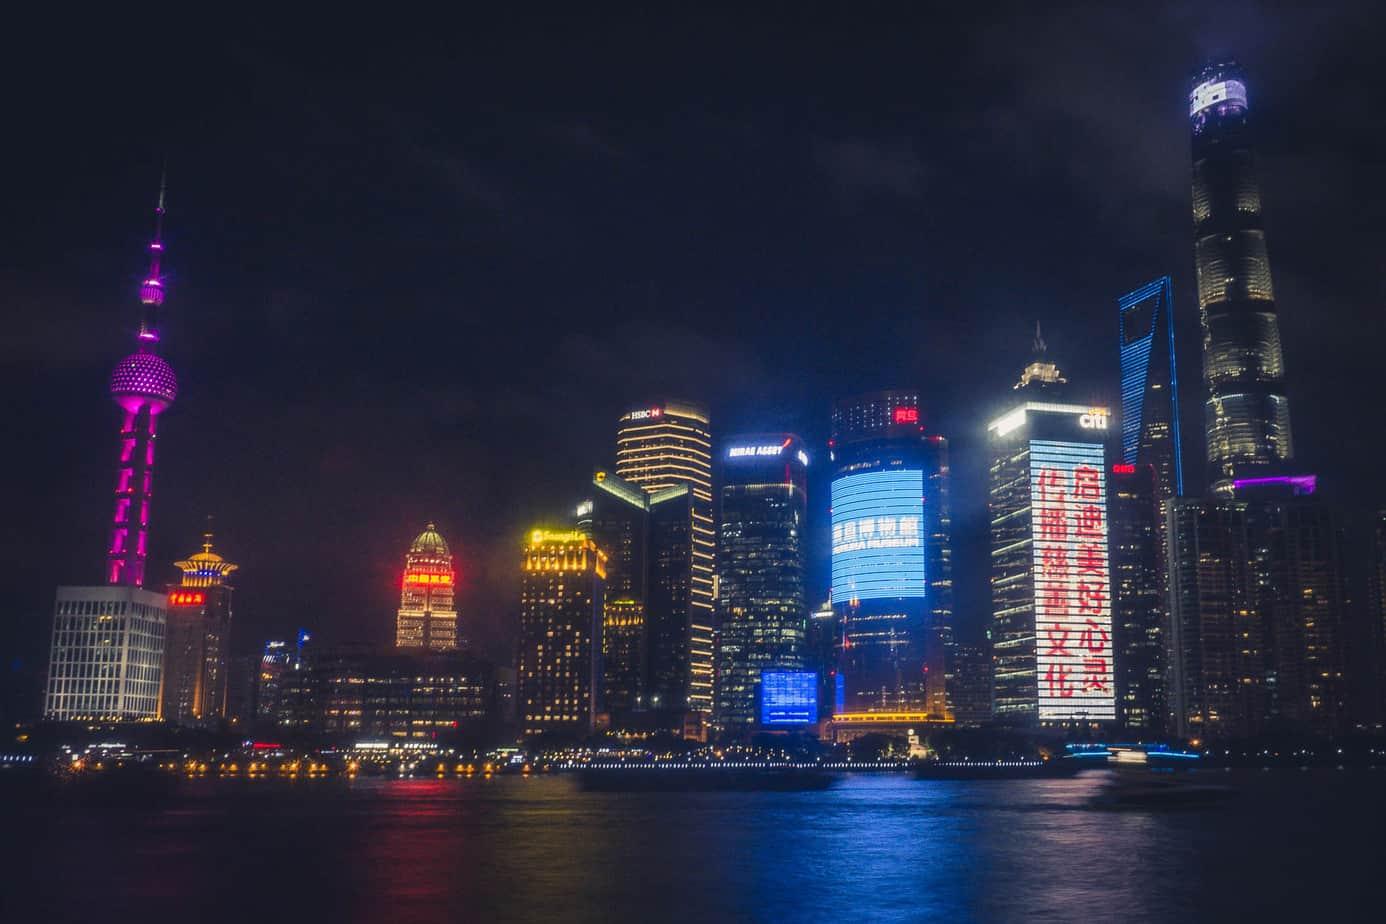 Shangai Pudong Skyline Night